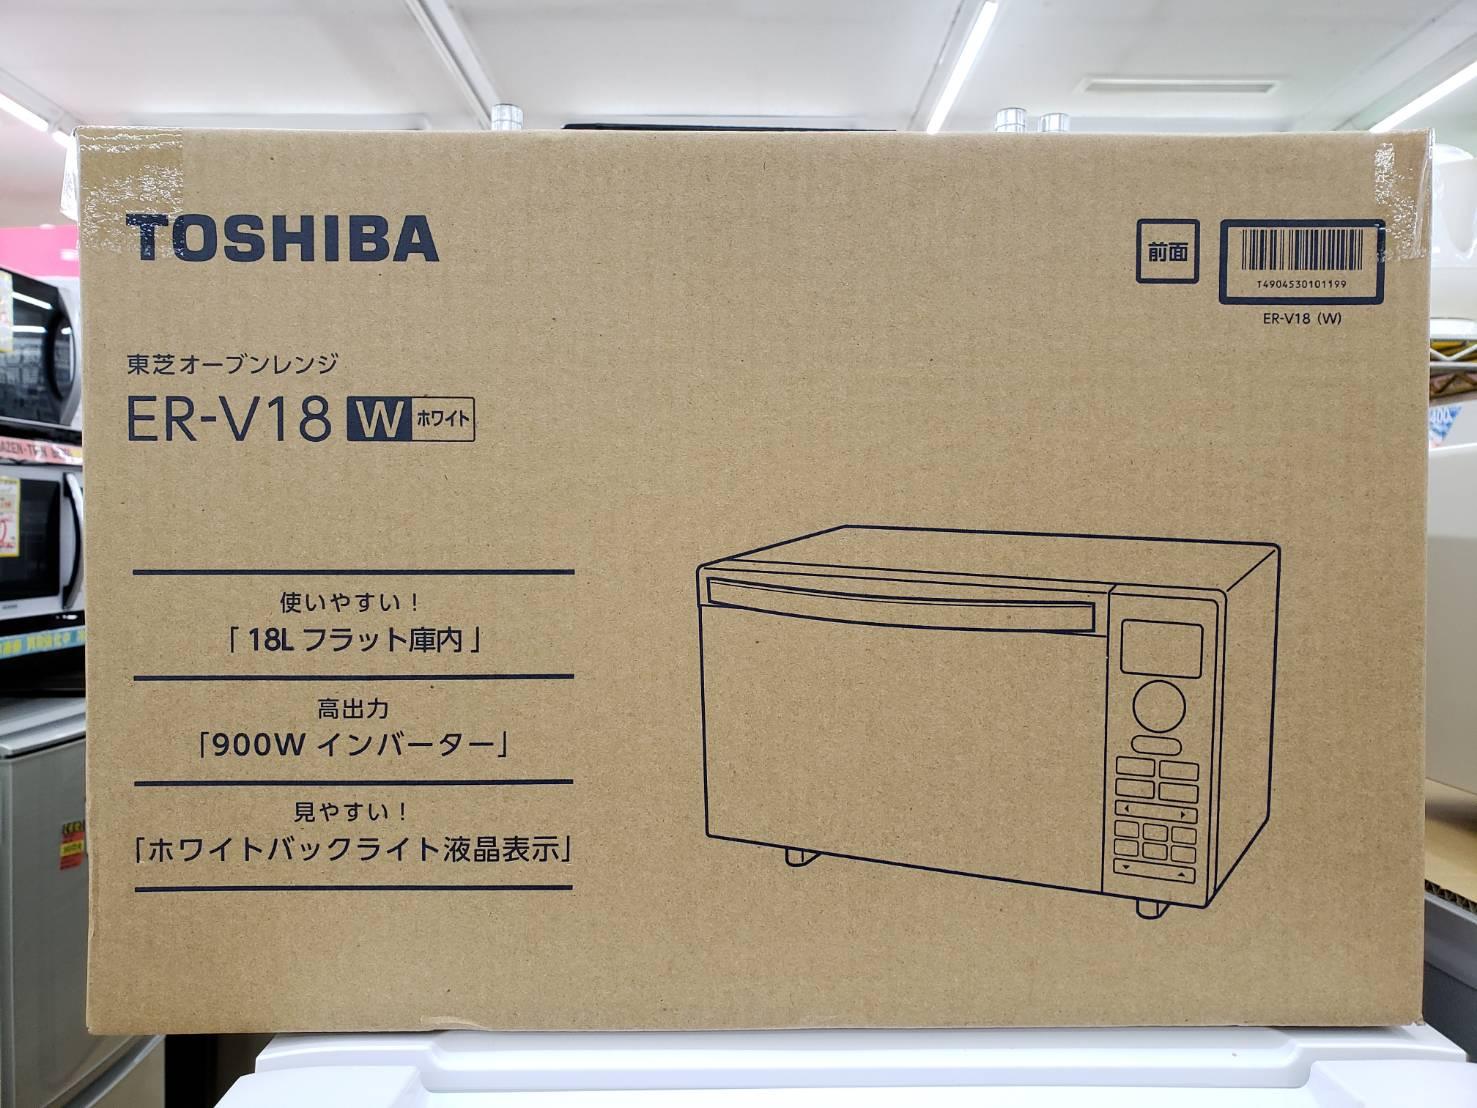 TOSHIBA / 東芝 / 新品未開封 オーブンレンジ ER-V18 買取致しました。 の買取-